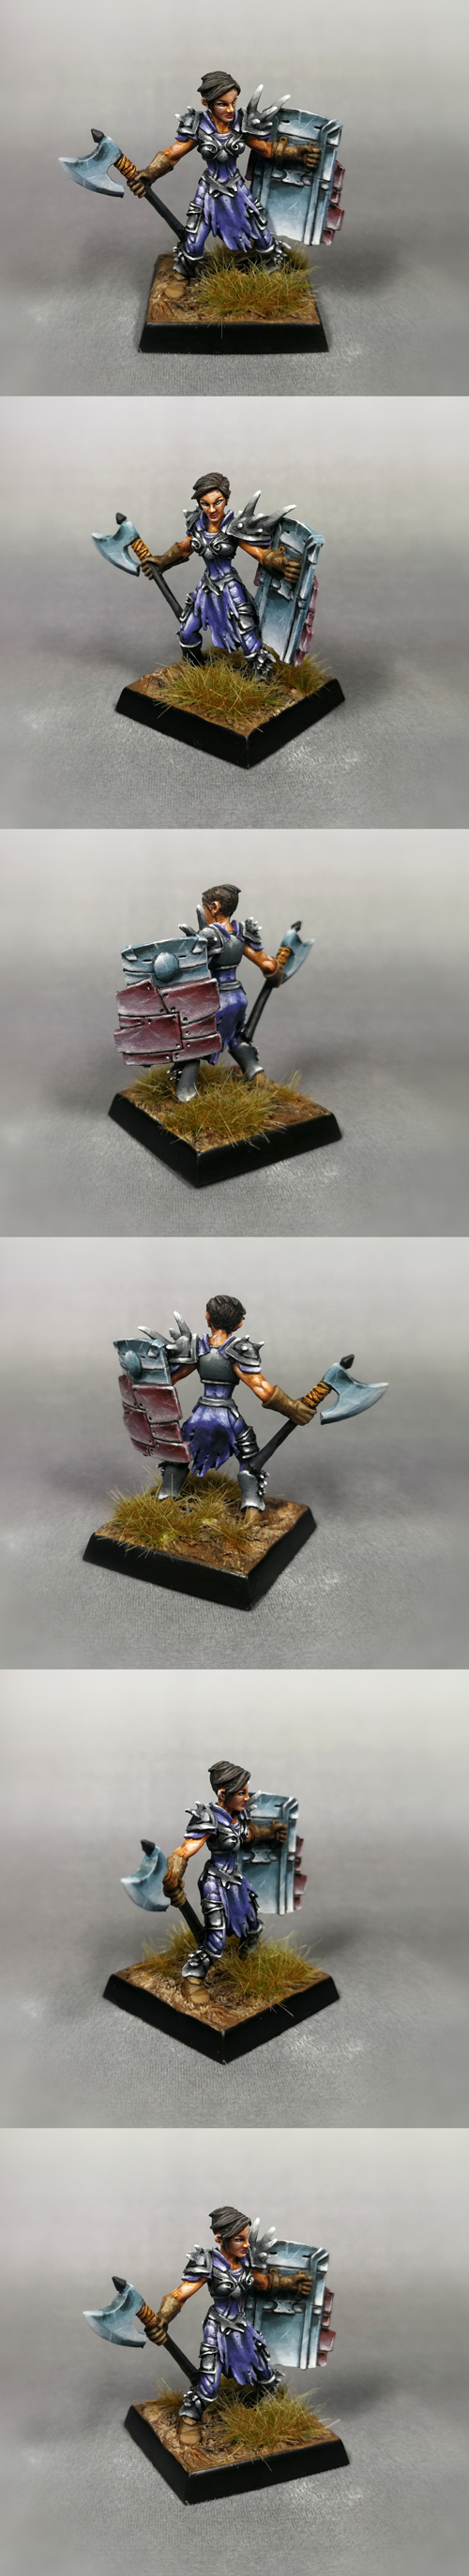 Kul Inkit - Human barbarian/fighter